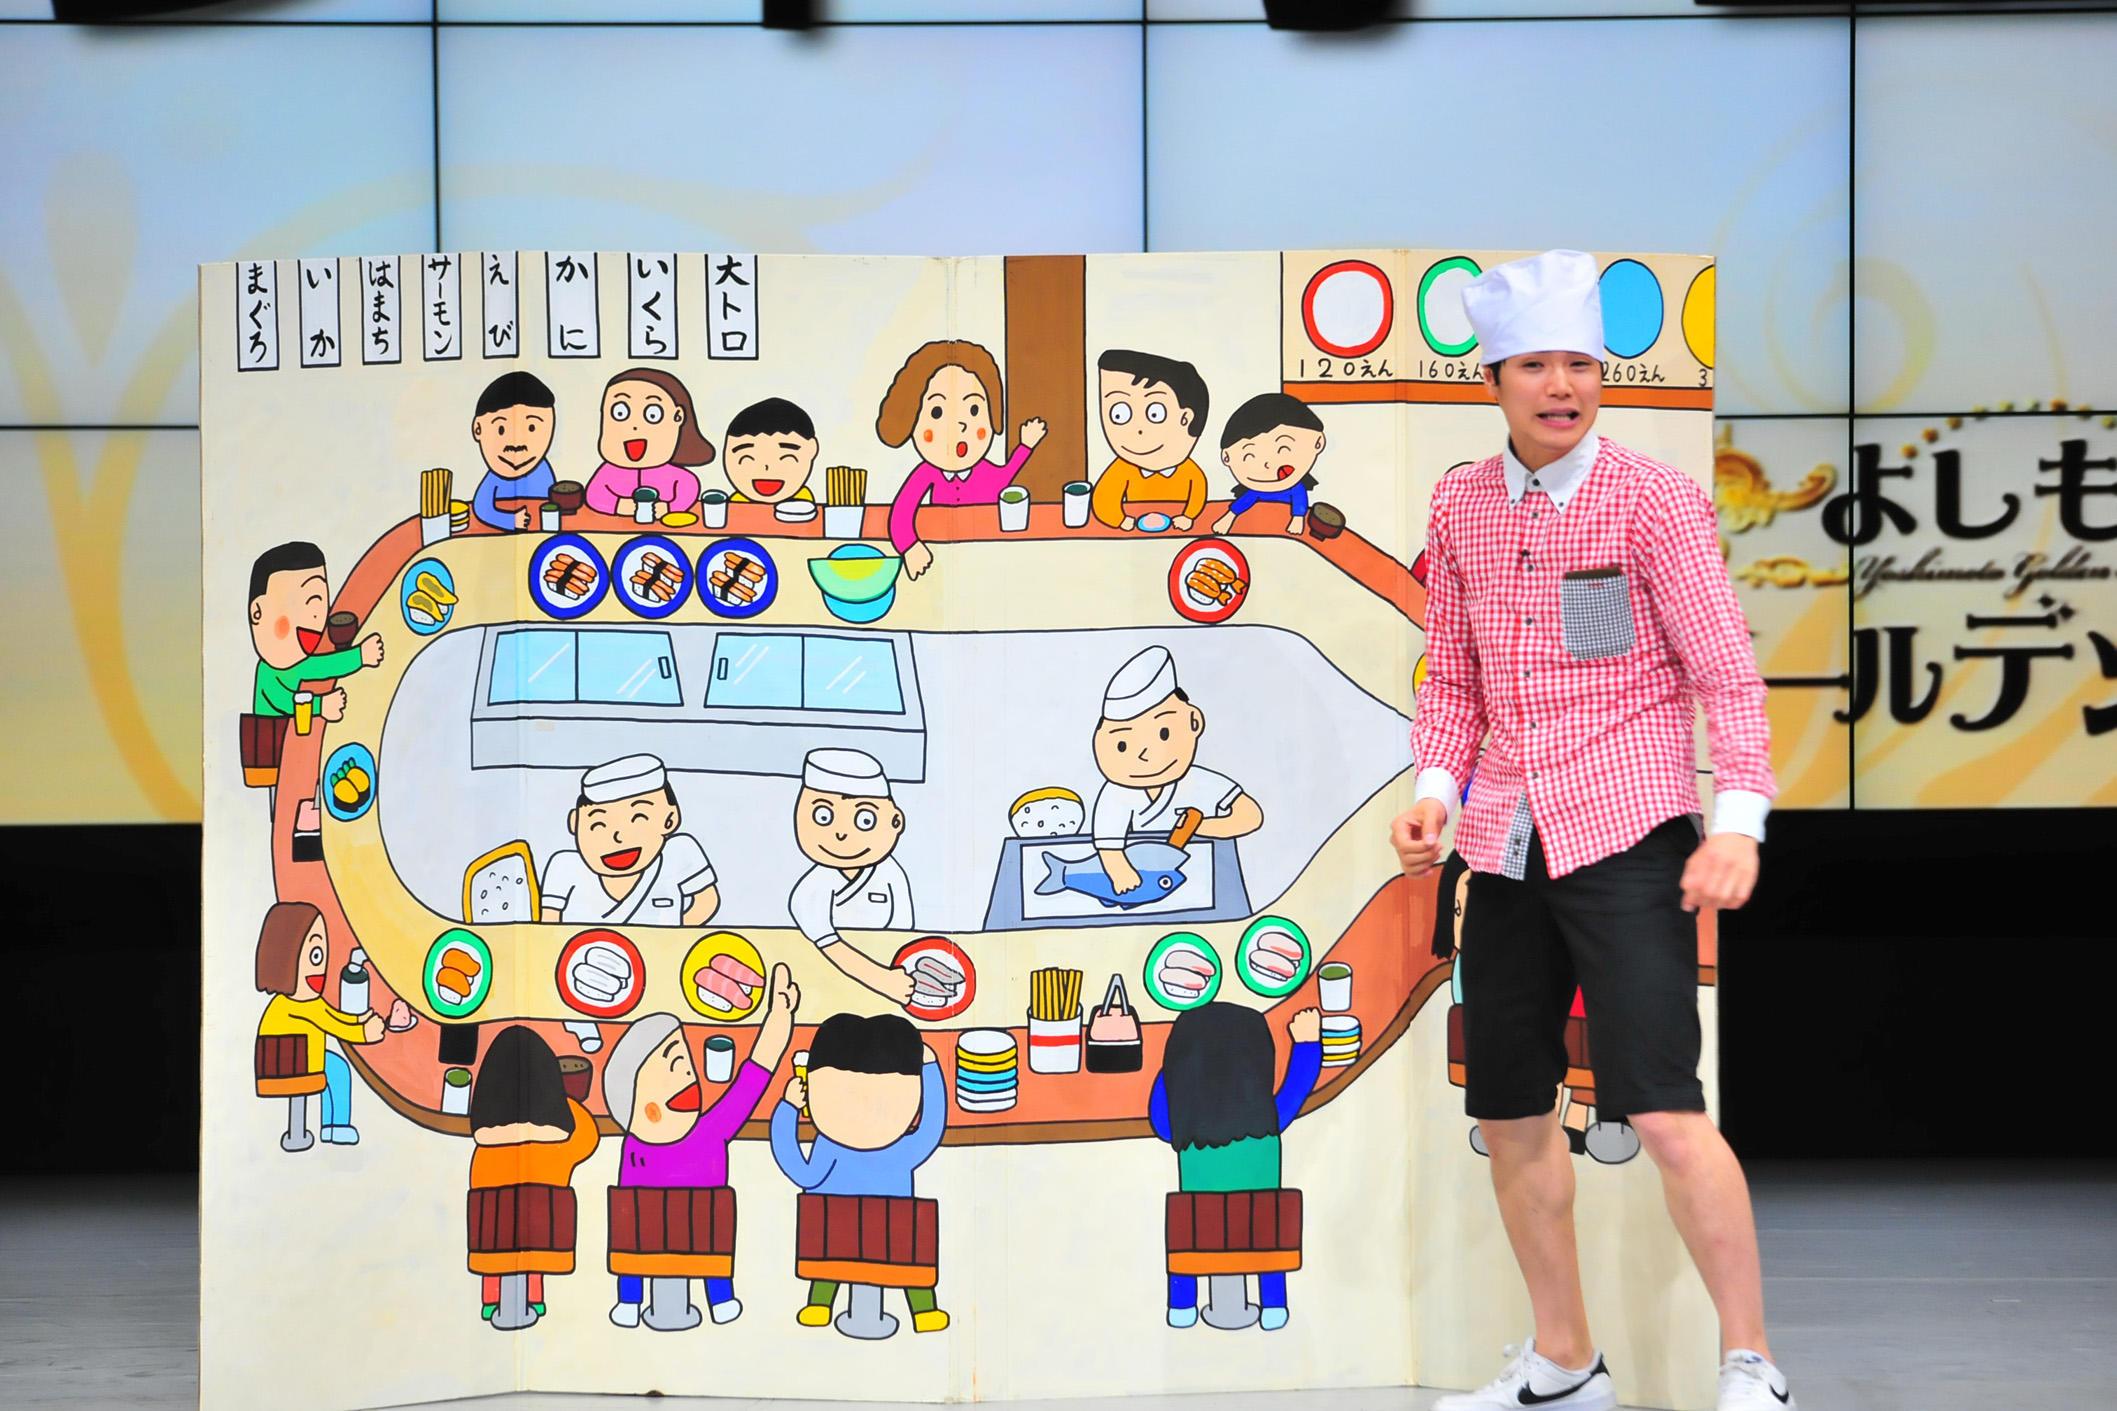 http://news.yoshimoto.co.jp/20160429204612-9cf7ab8e529cbdbfeaf834af09aadd256dbc90dc.jpg